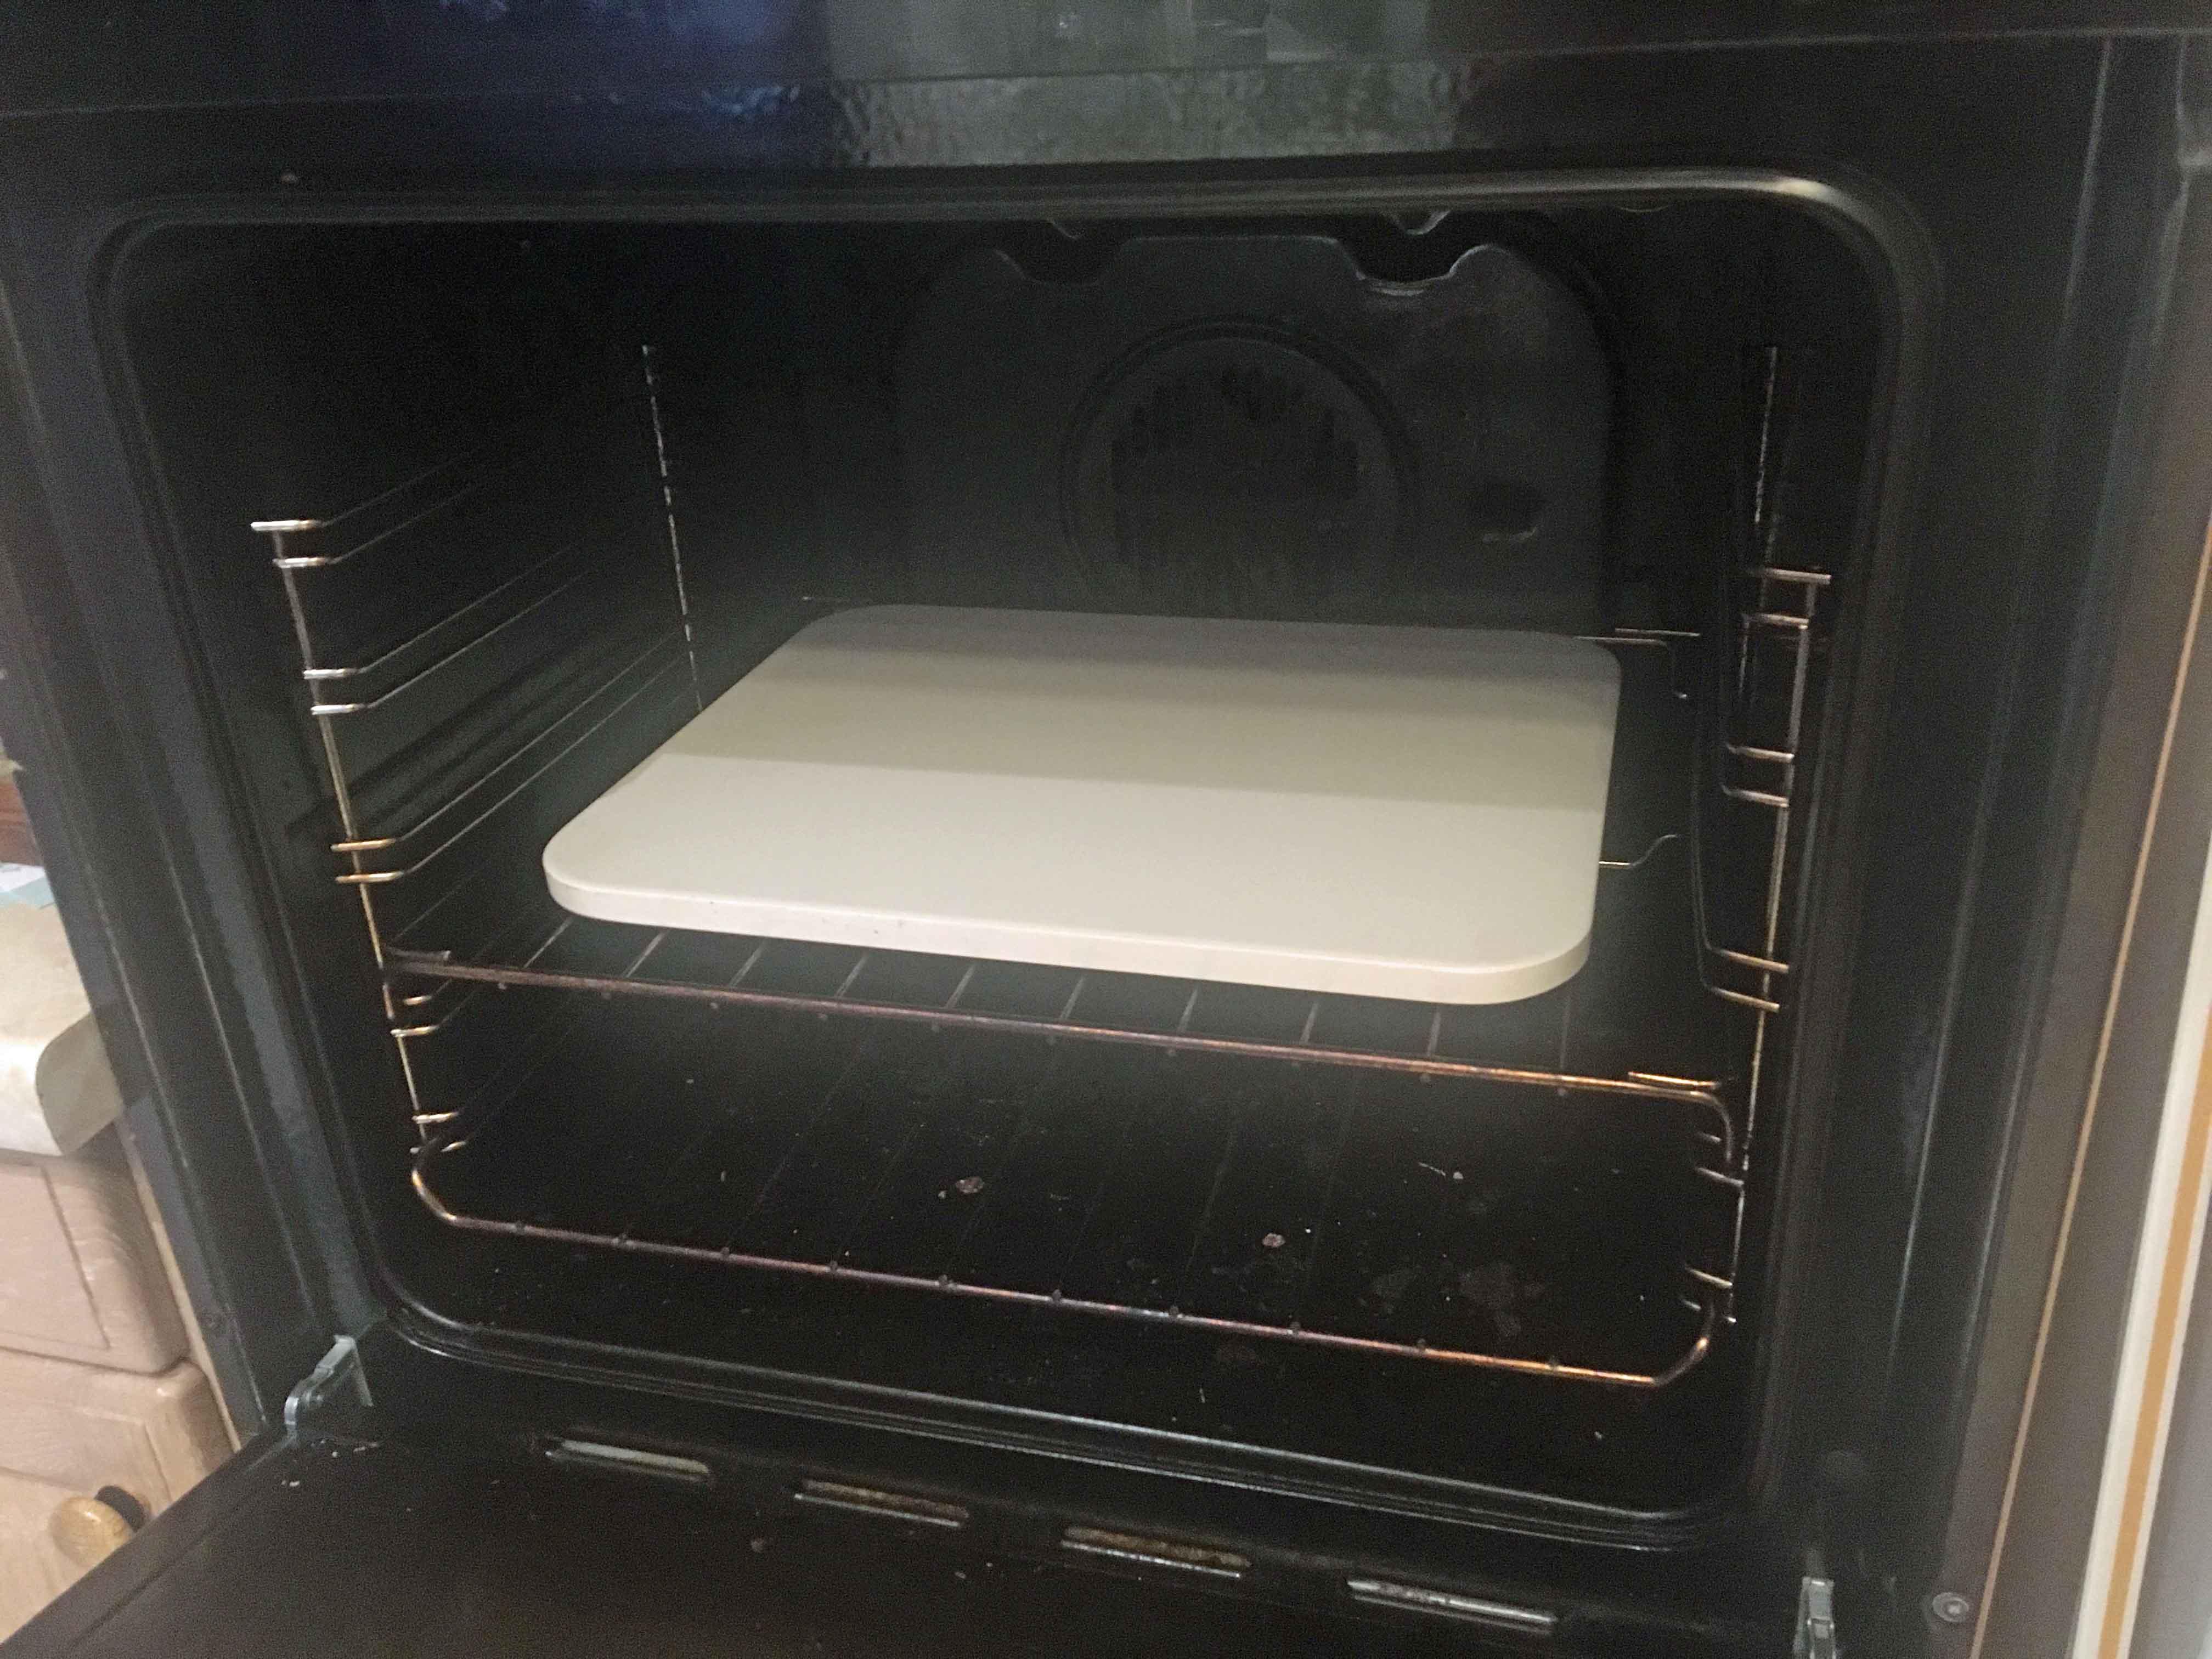 home oven.jpg